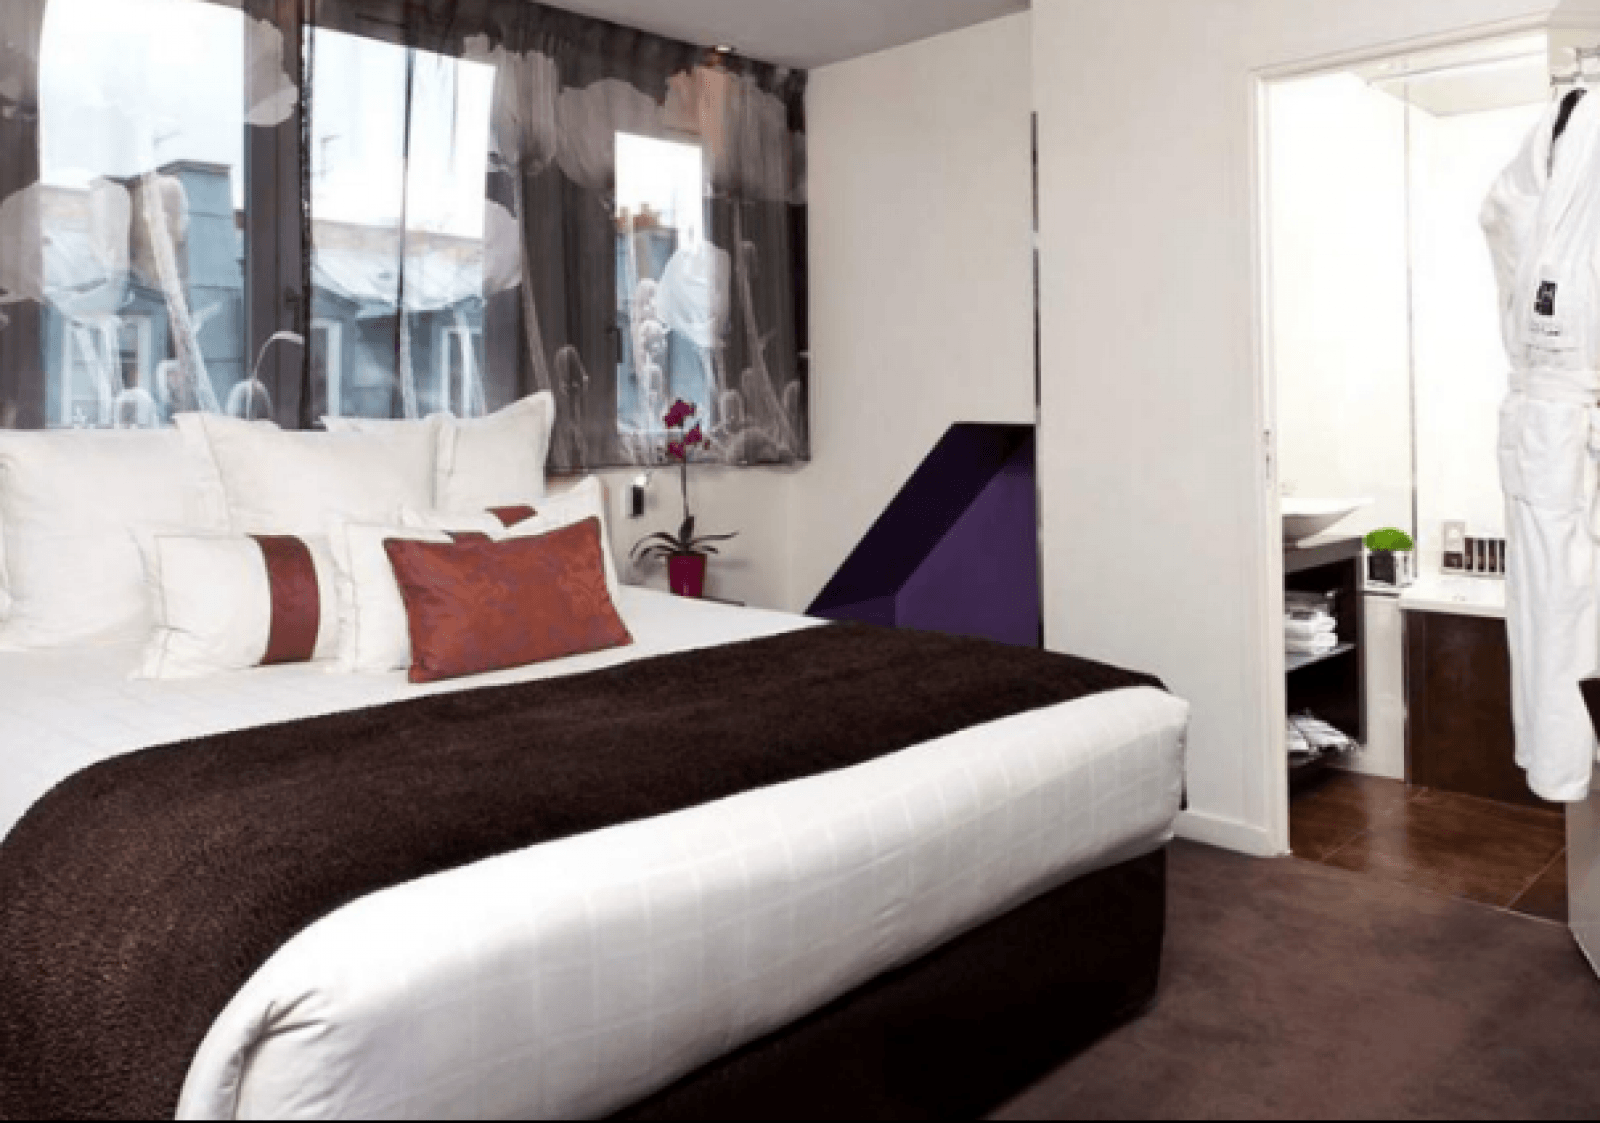 Grand Hotel Saint Michel Rooms